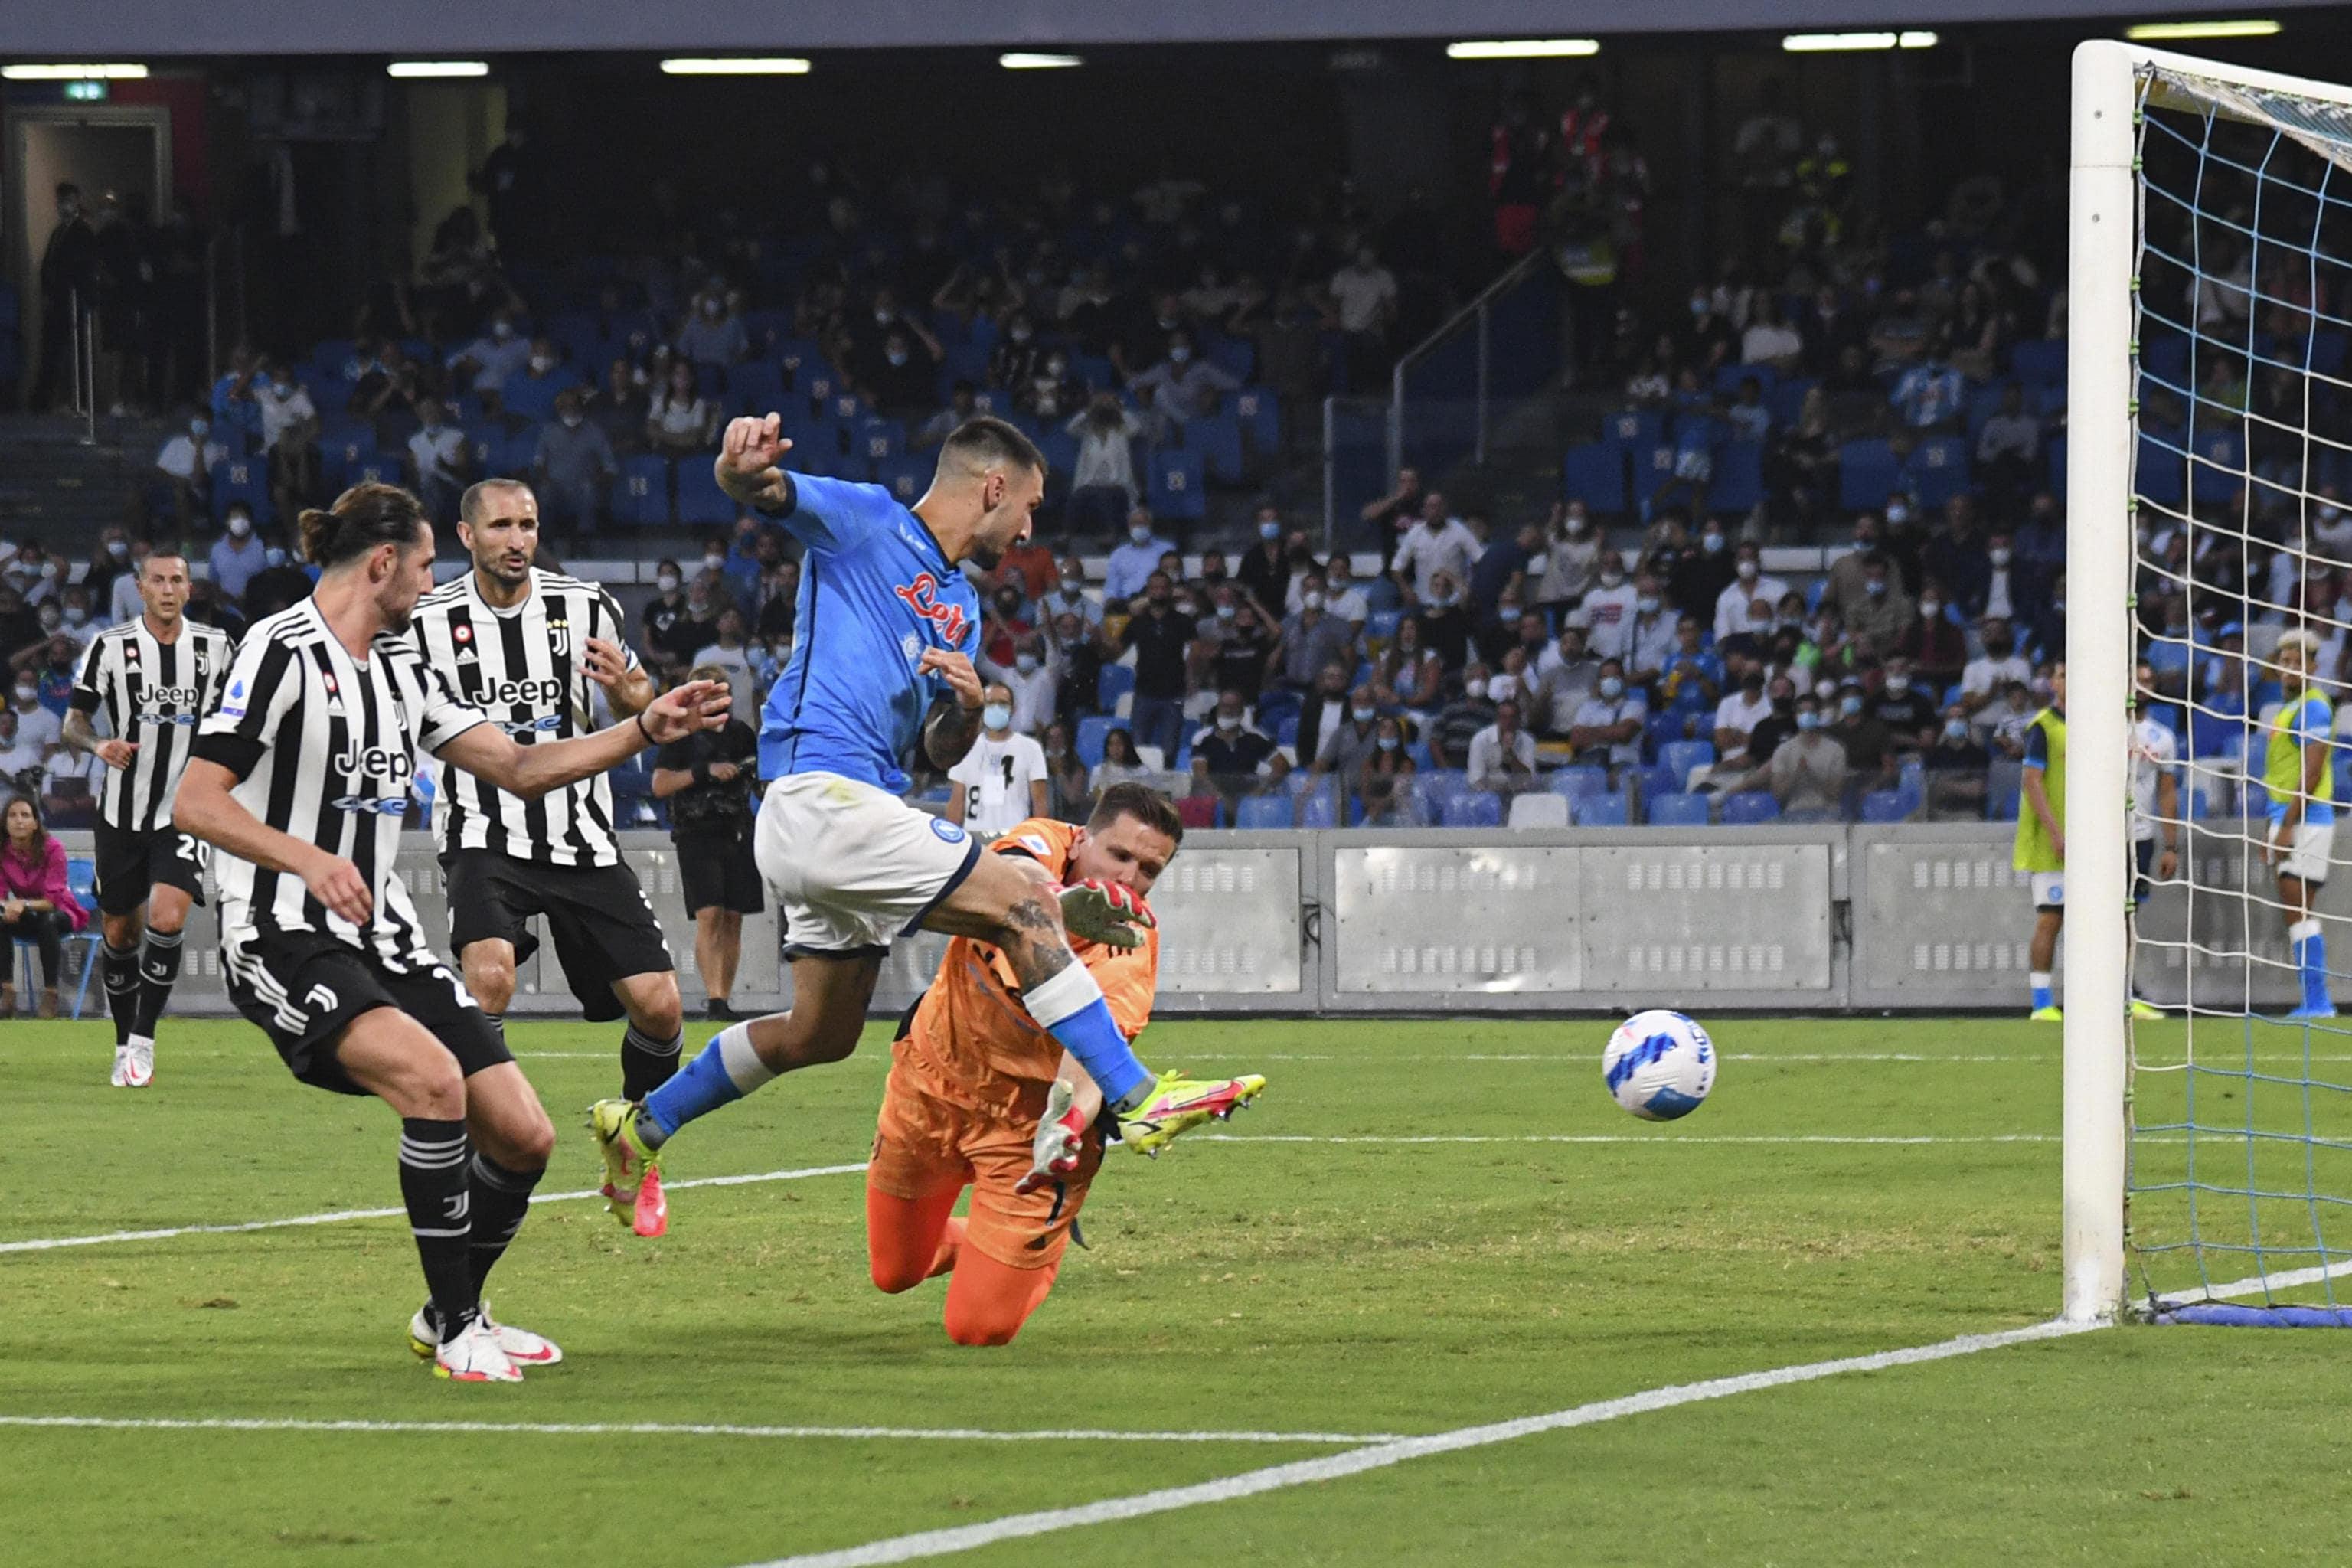 Serie A: Empoli - Venezia 1 - 2, Napoli - Juventus 2 - 1 e Atalanta -  Fiorentina 1 - 2.